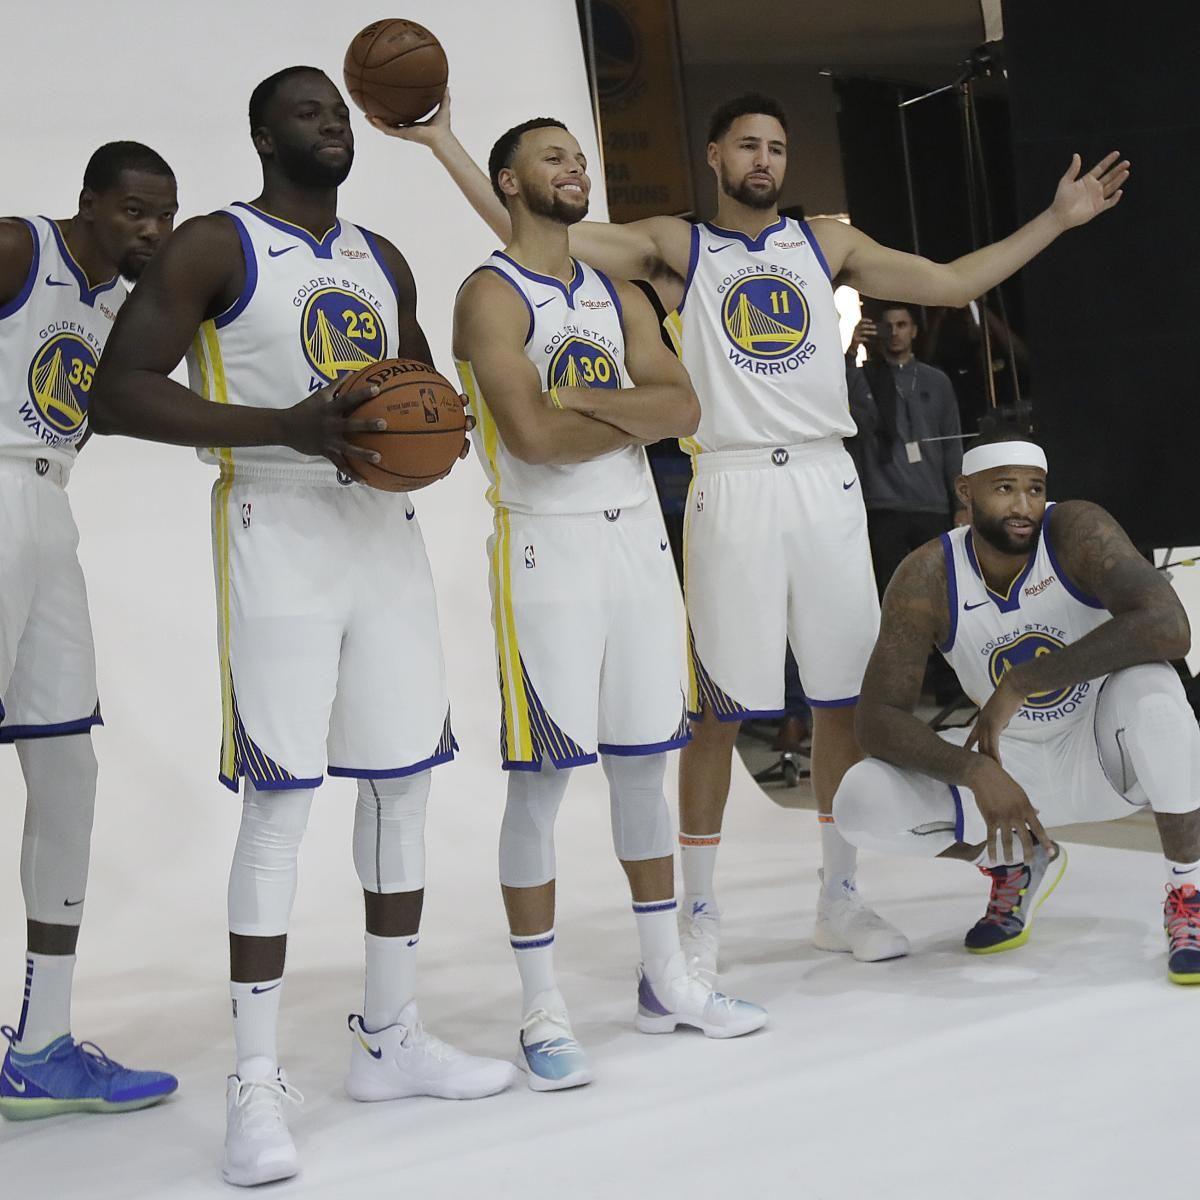 Warriors Media Day 2018 Stephen Curry Demarcus Cousins Interviews Video More Golden State Warriors Basketball Nba Golden State Warriors Basketball Highlights